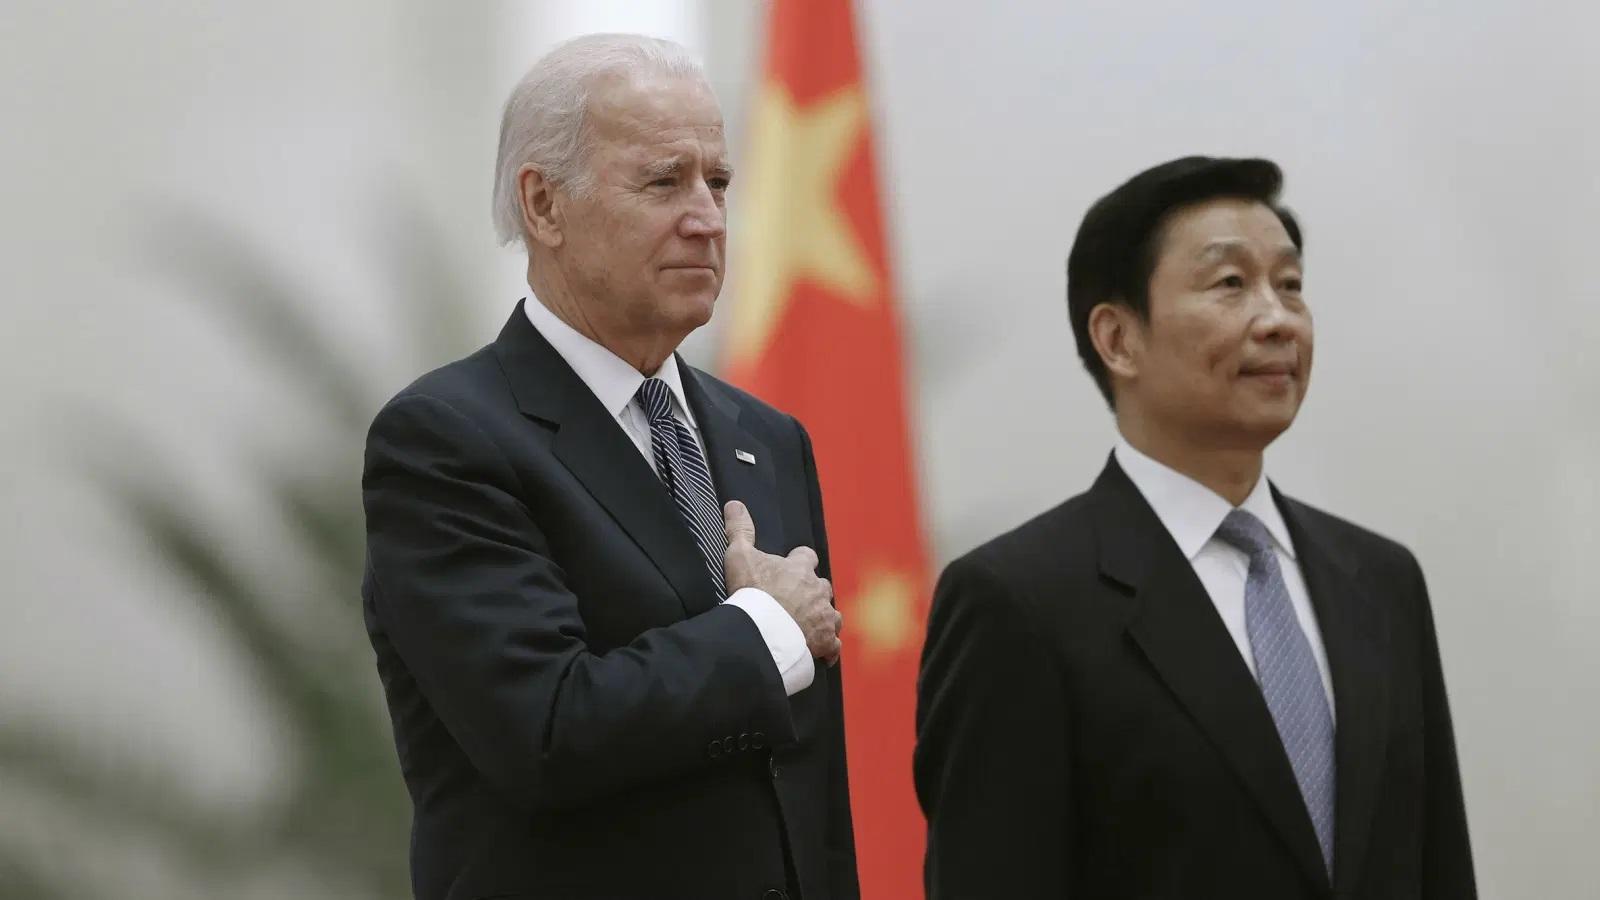 China tells Biden to Reverse Trump's Dangerous Policy on Taiwan